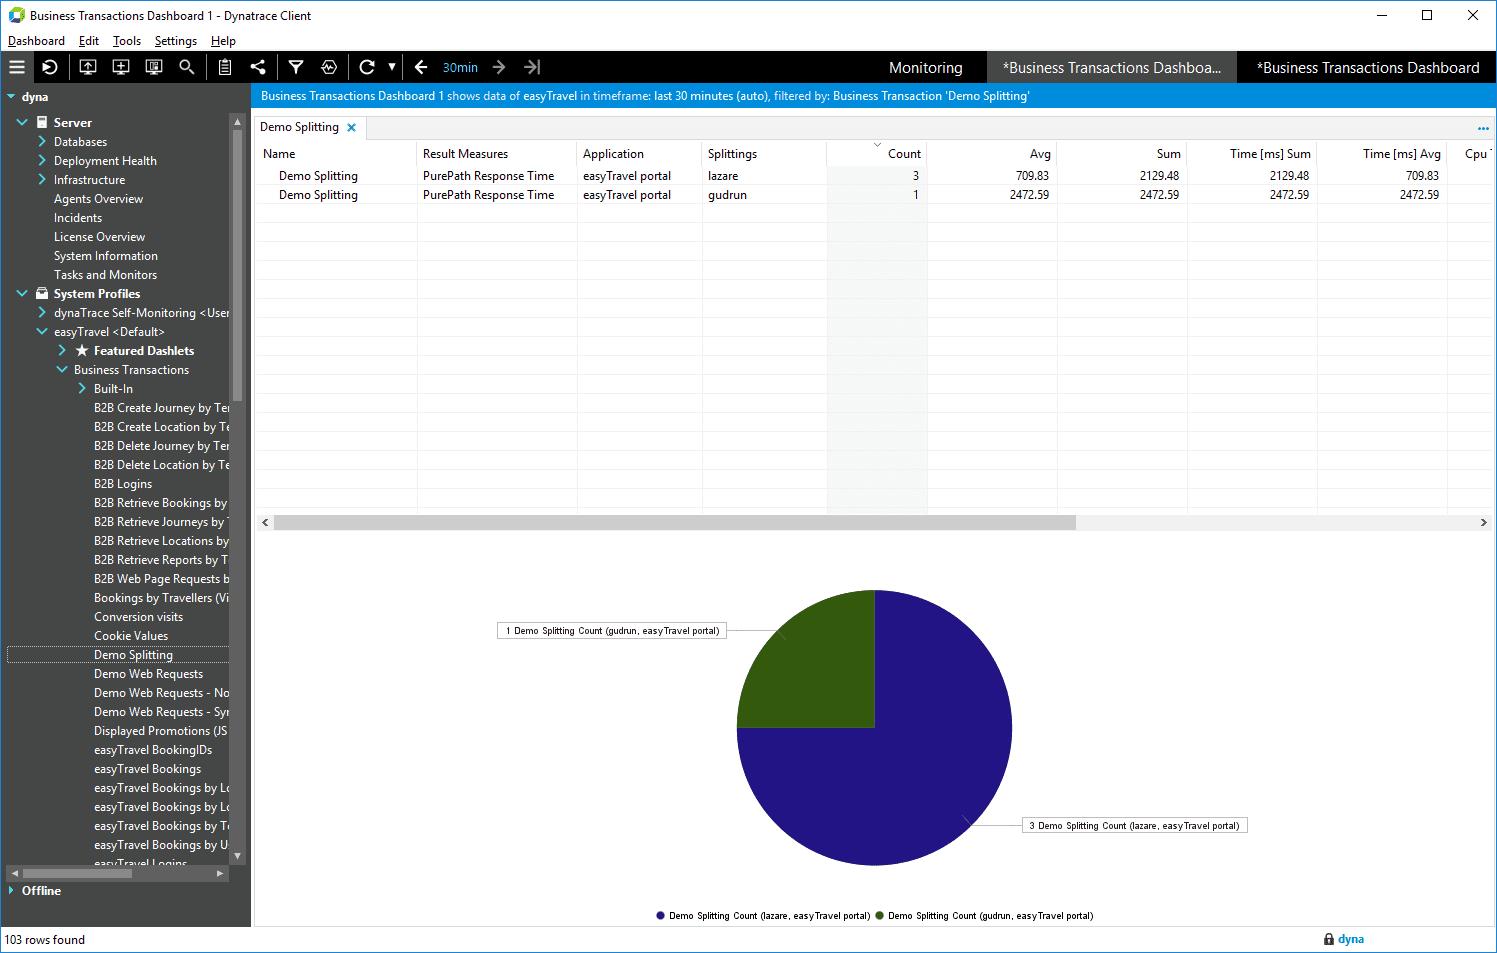 Business Transaction dashboard